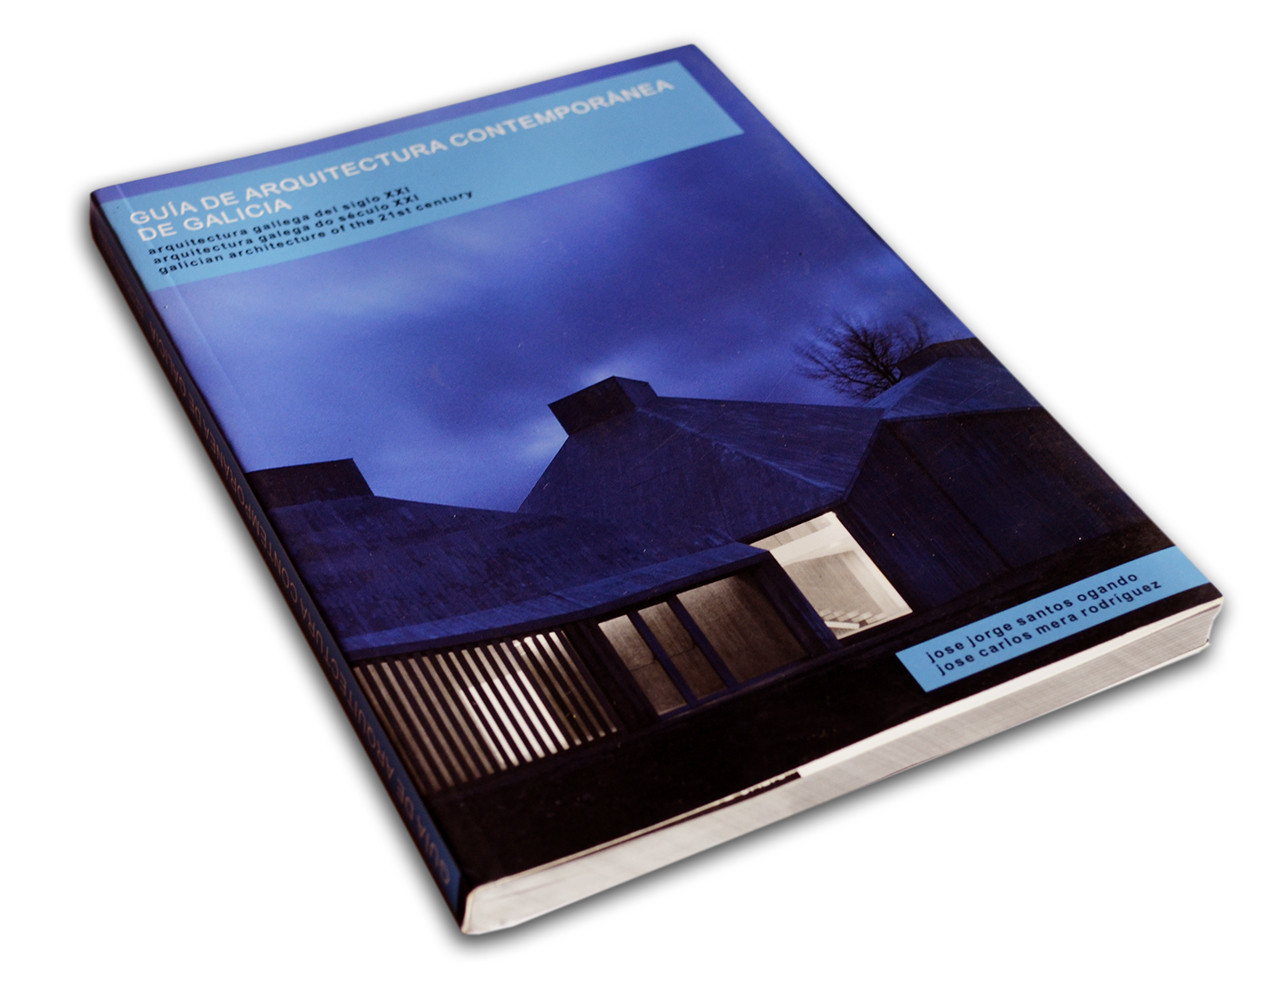 Guía de Arquitectura Contemporánea de Galicia, Arquitectura Gallega del siglo XXI